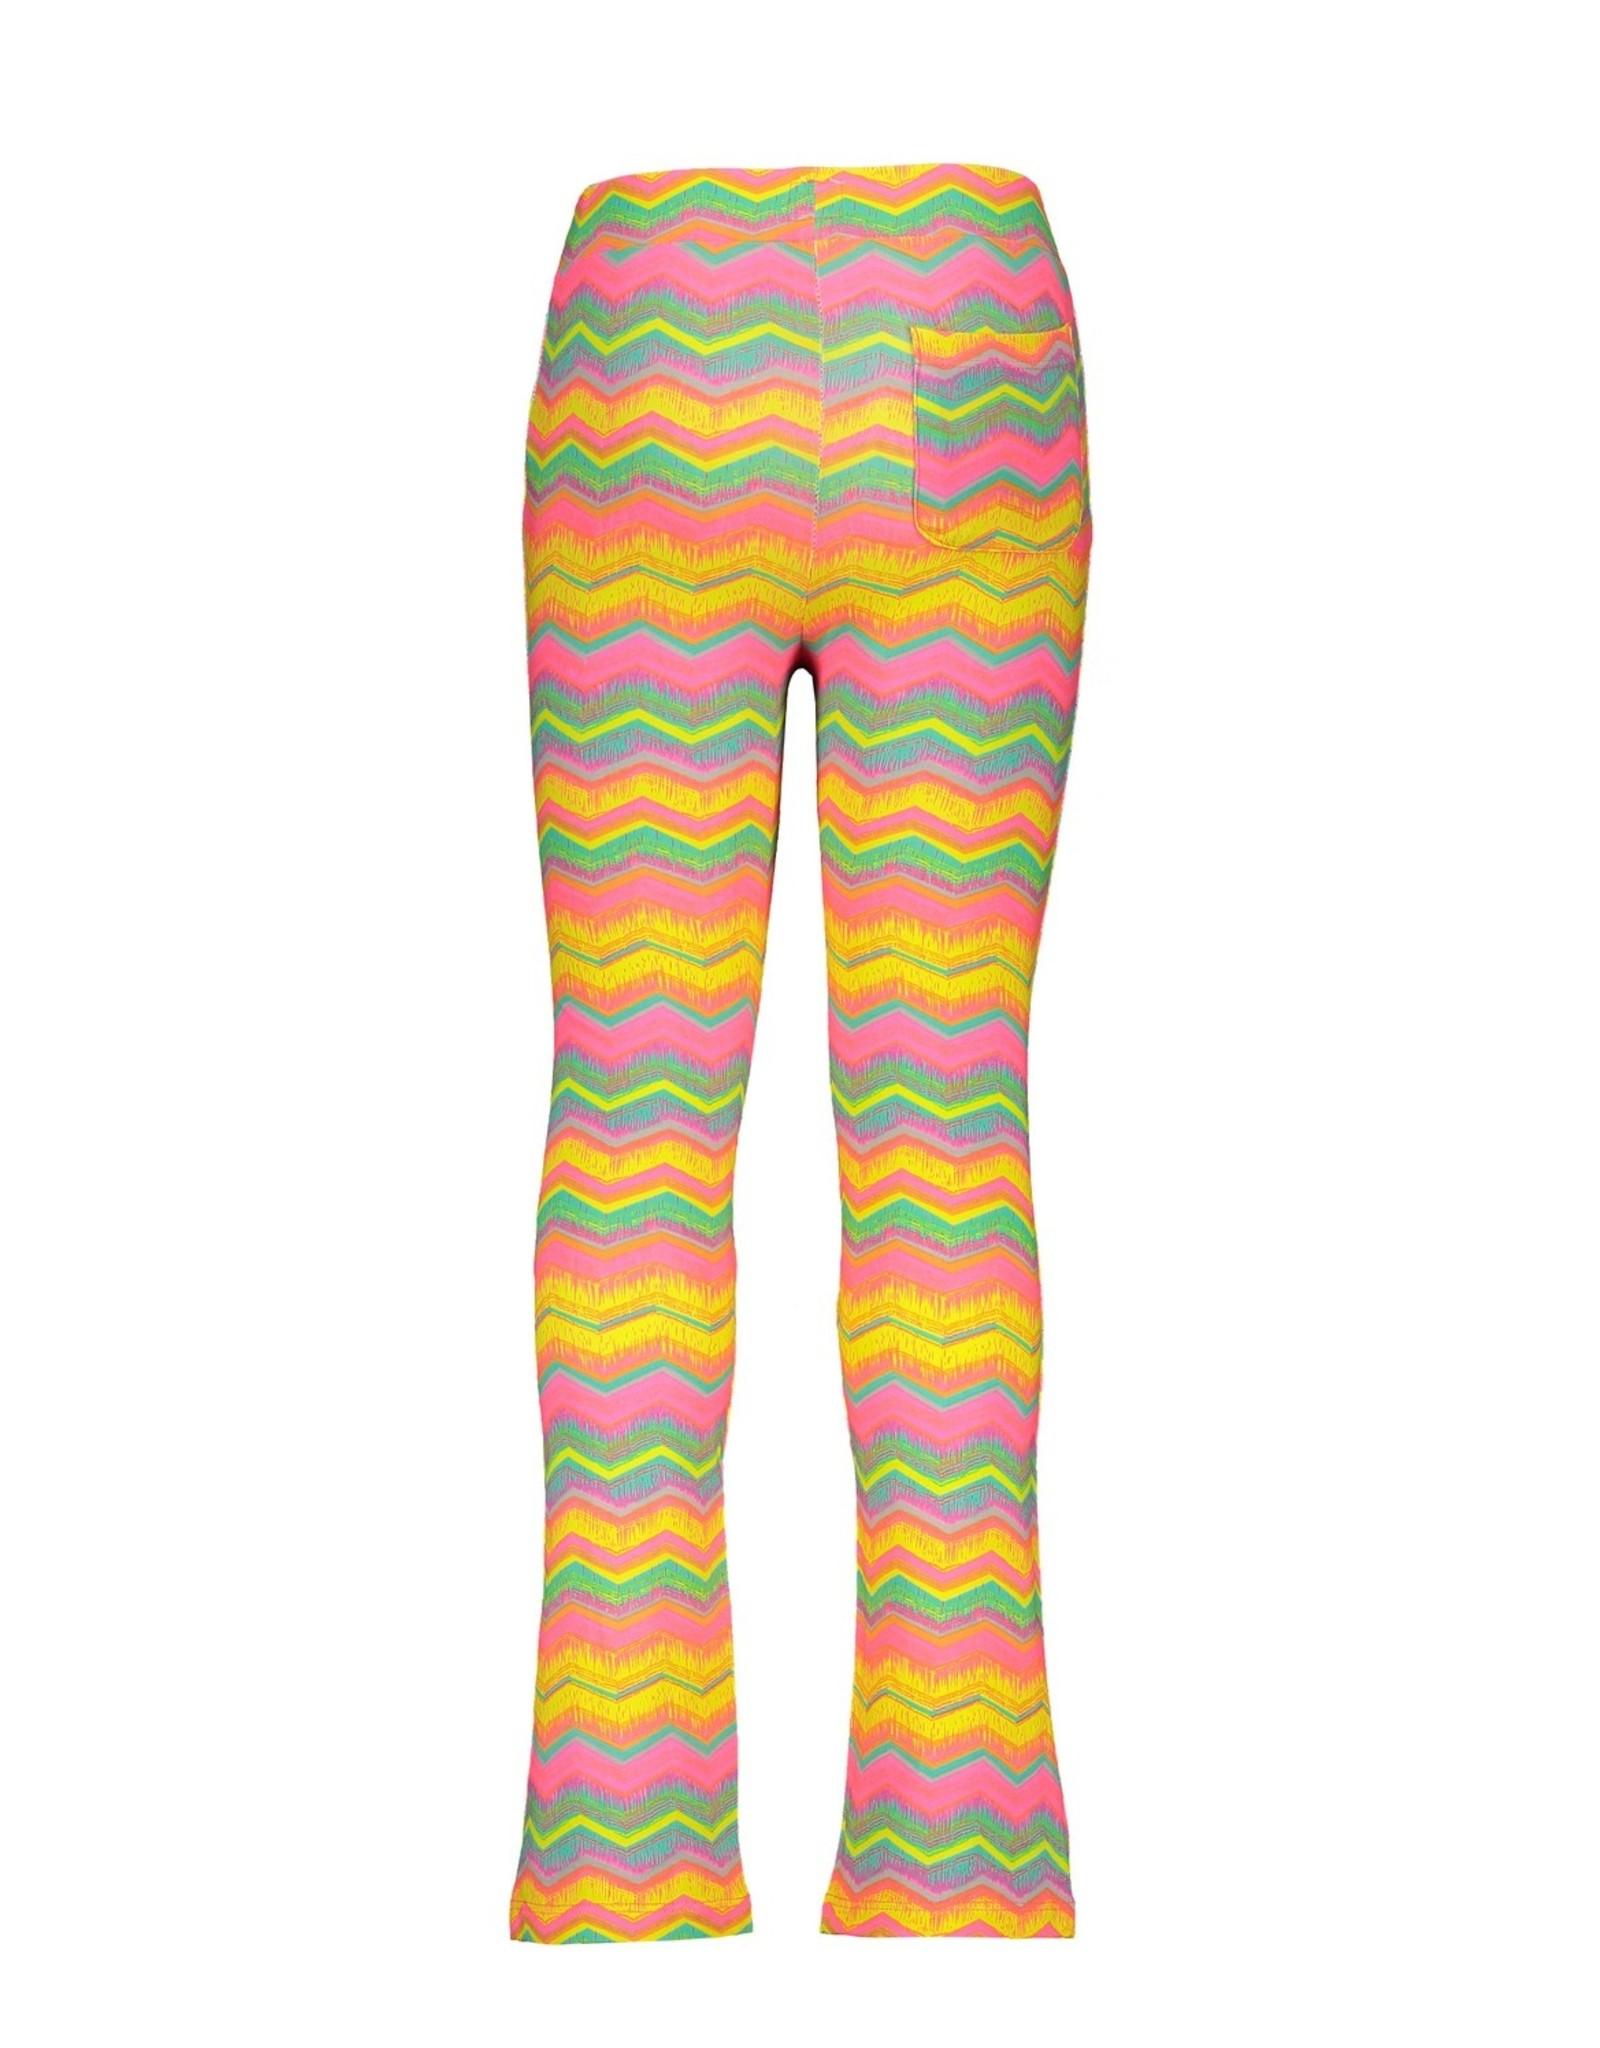 Kidz-Art Flair pants allover print